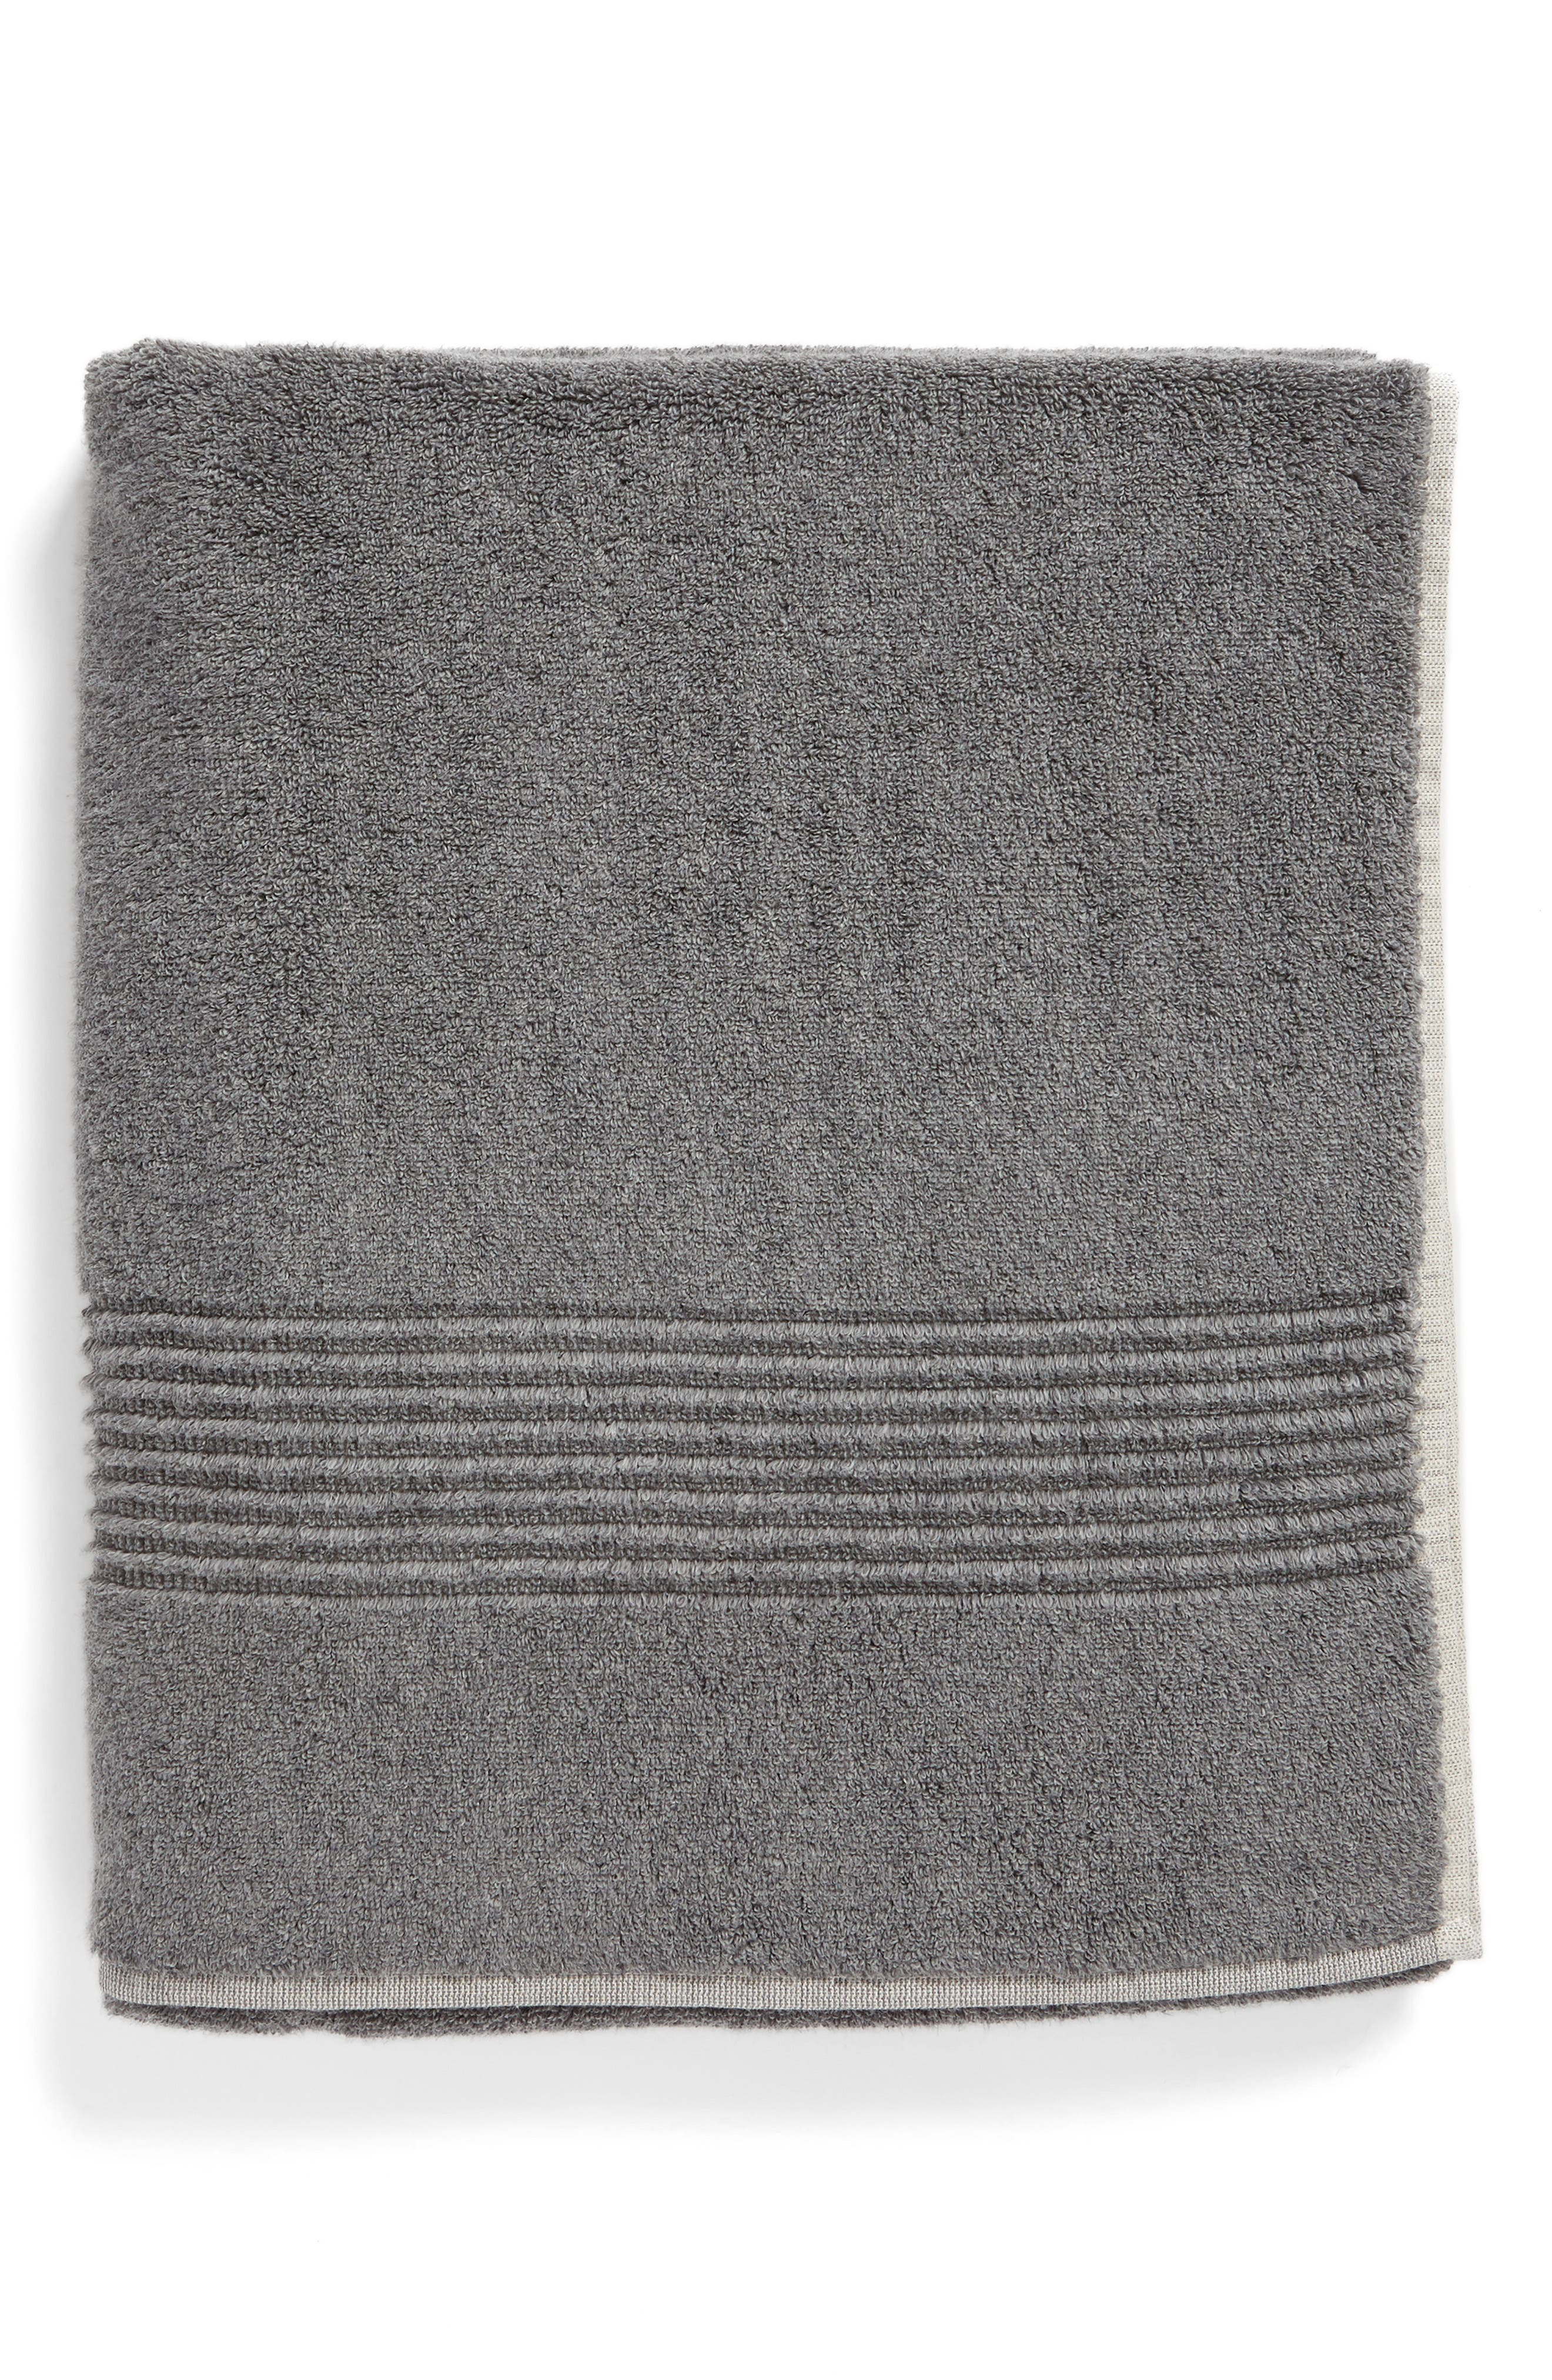 Organic Hydrocotton Bath Towel,                         Main,                         color, GREY PEARL